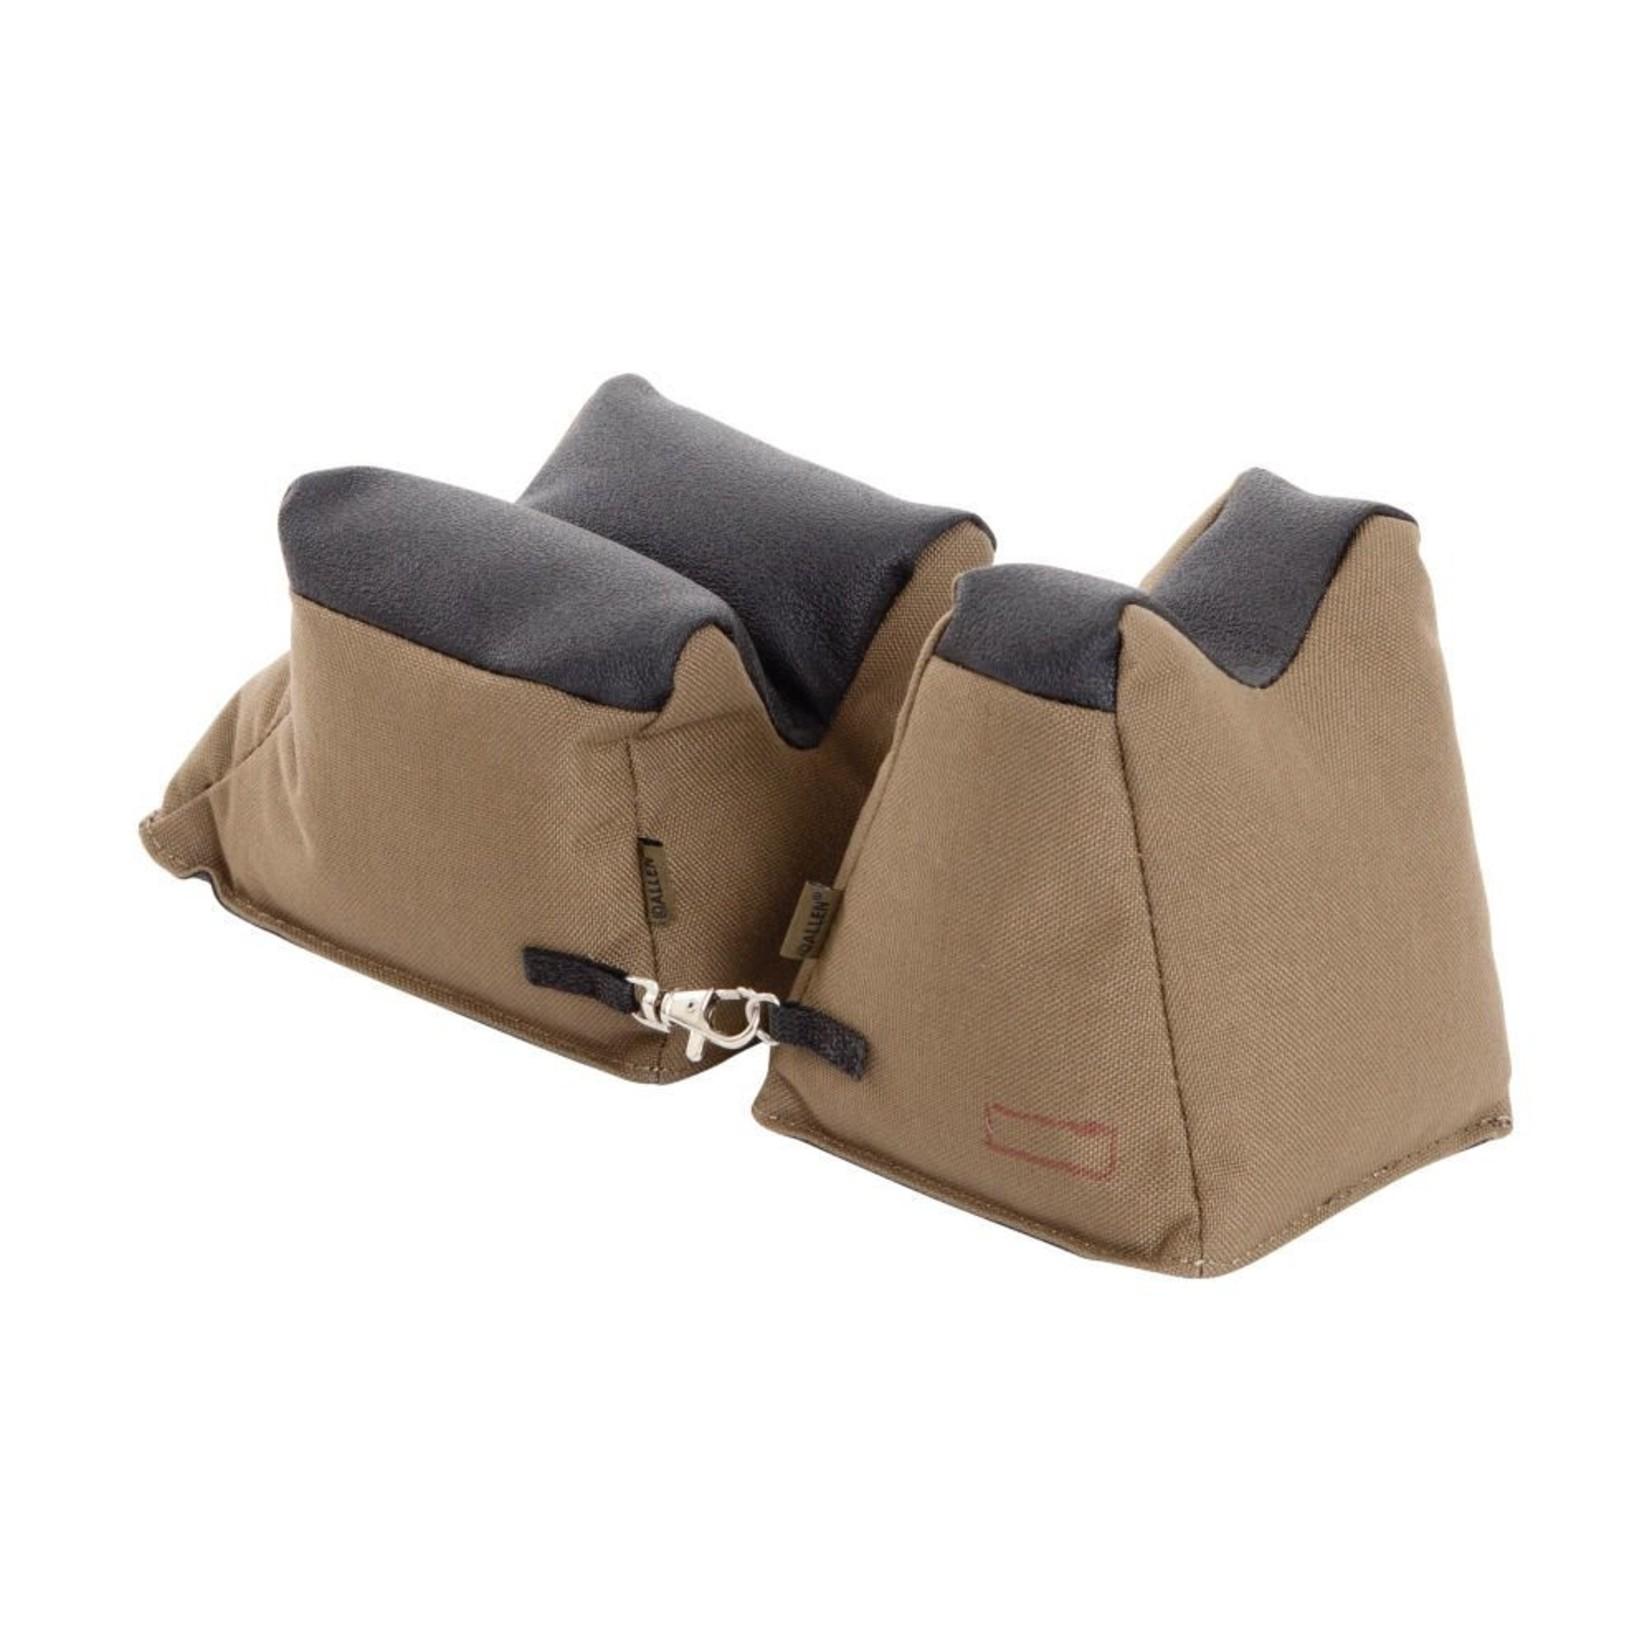 Allen Filled Front/ Rear Rest Combo